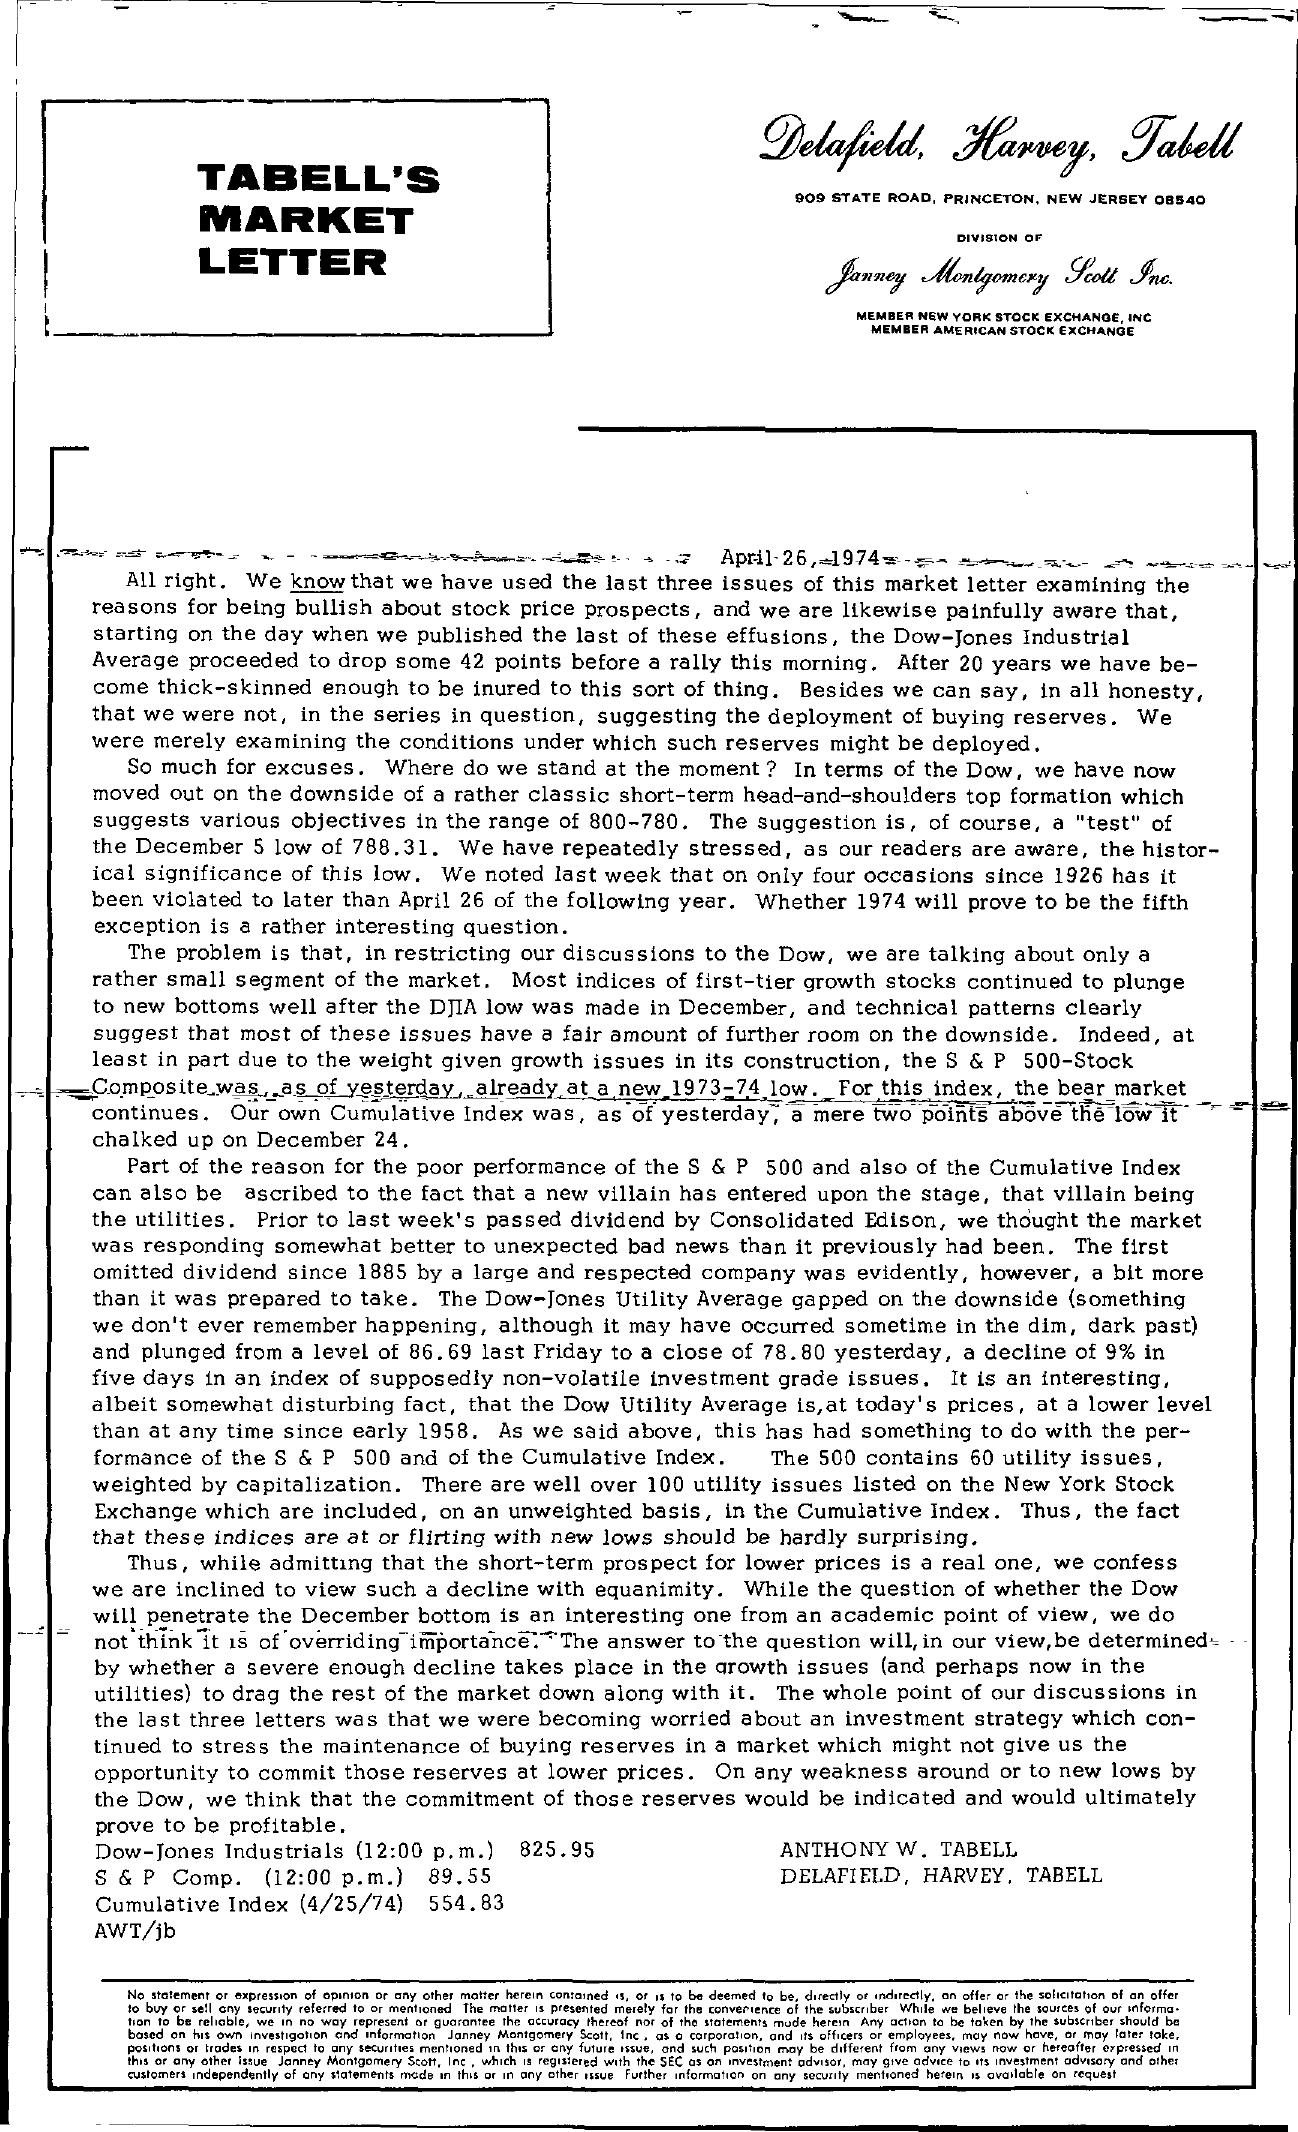 Tabell's Market Letter - April 26, 1974